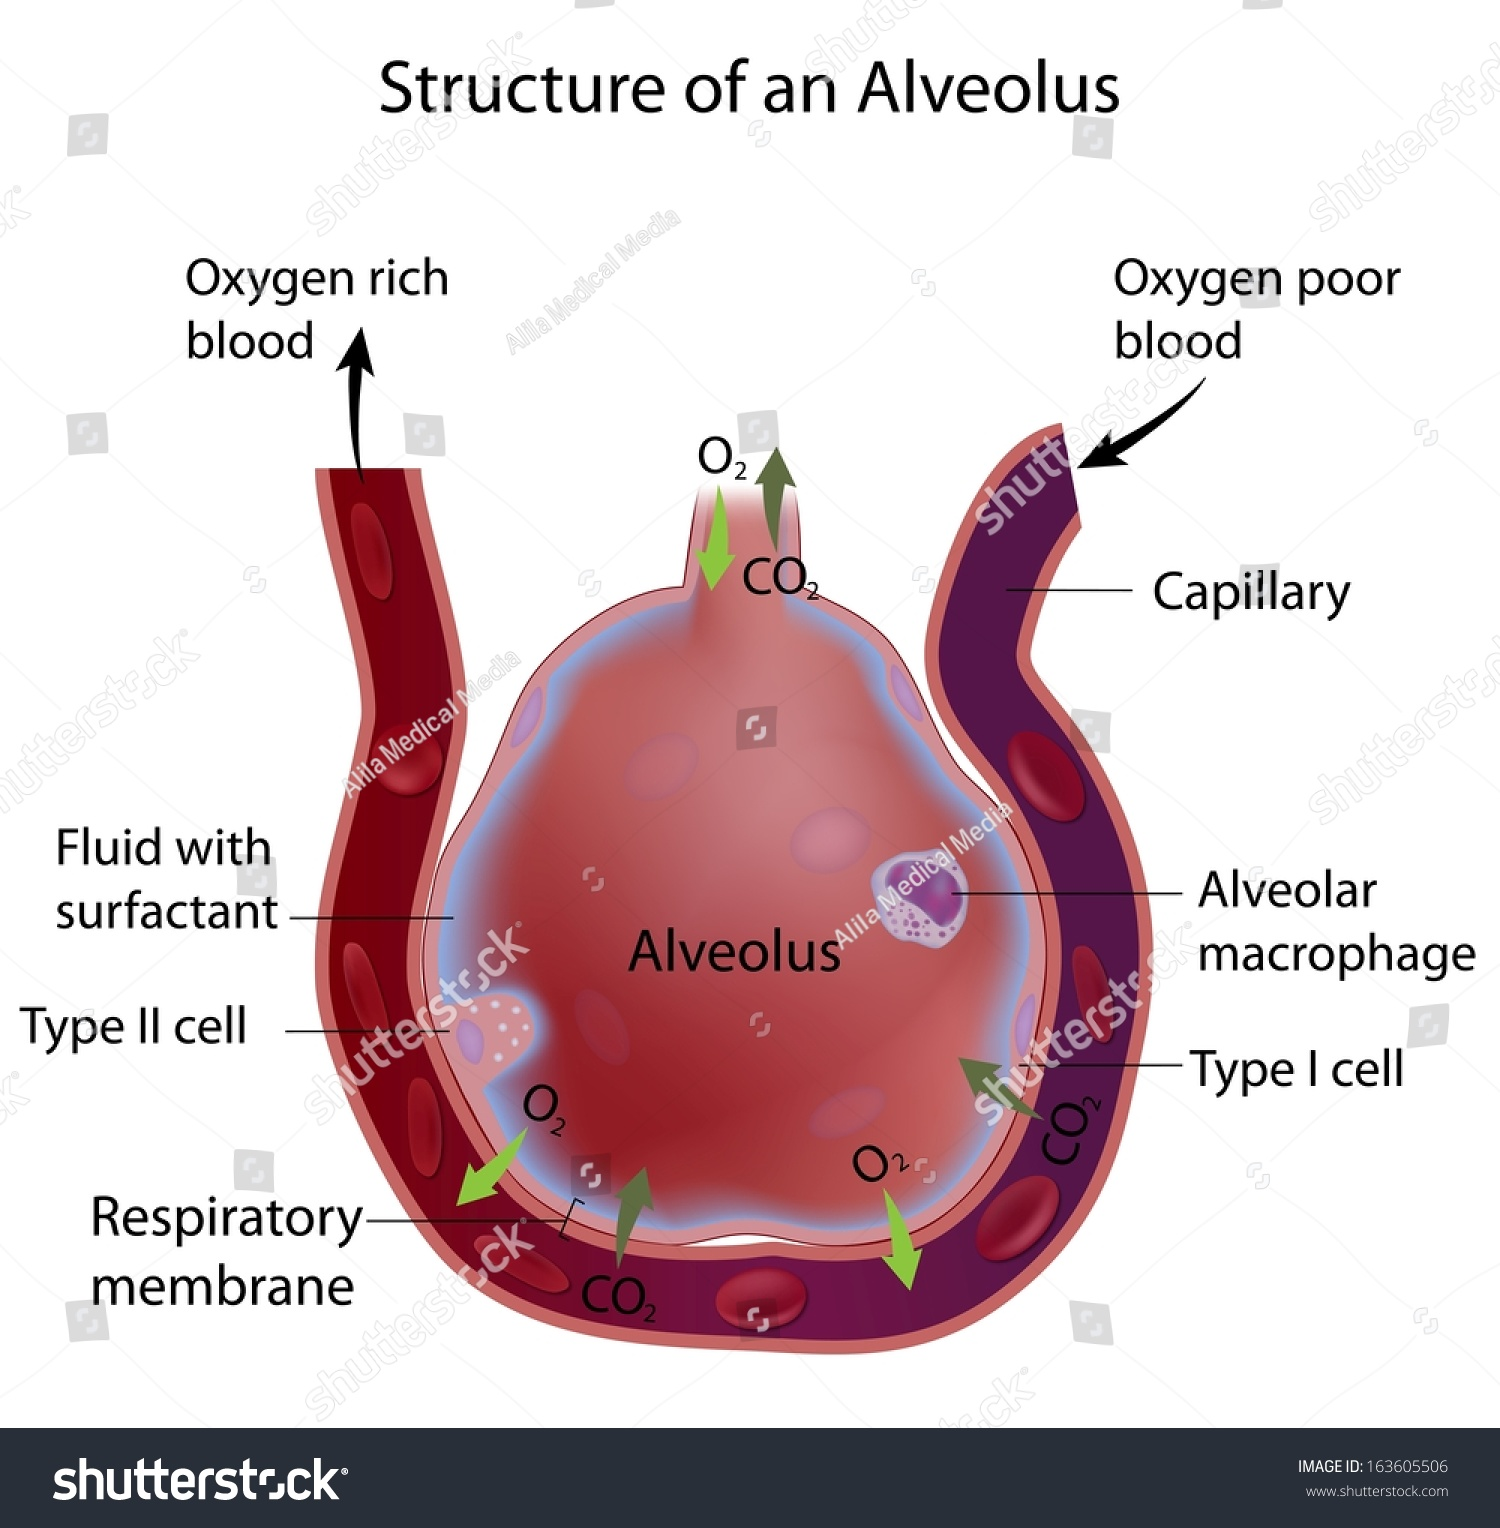 (http://image.shutterstock.com/z/stock-photo-structure-of-an-alveolus-163605506.jpg)